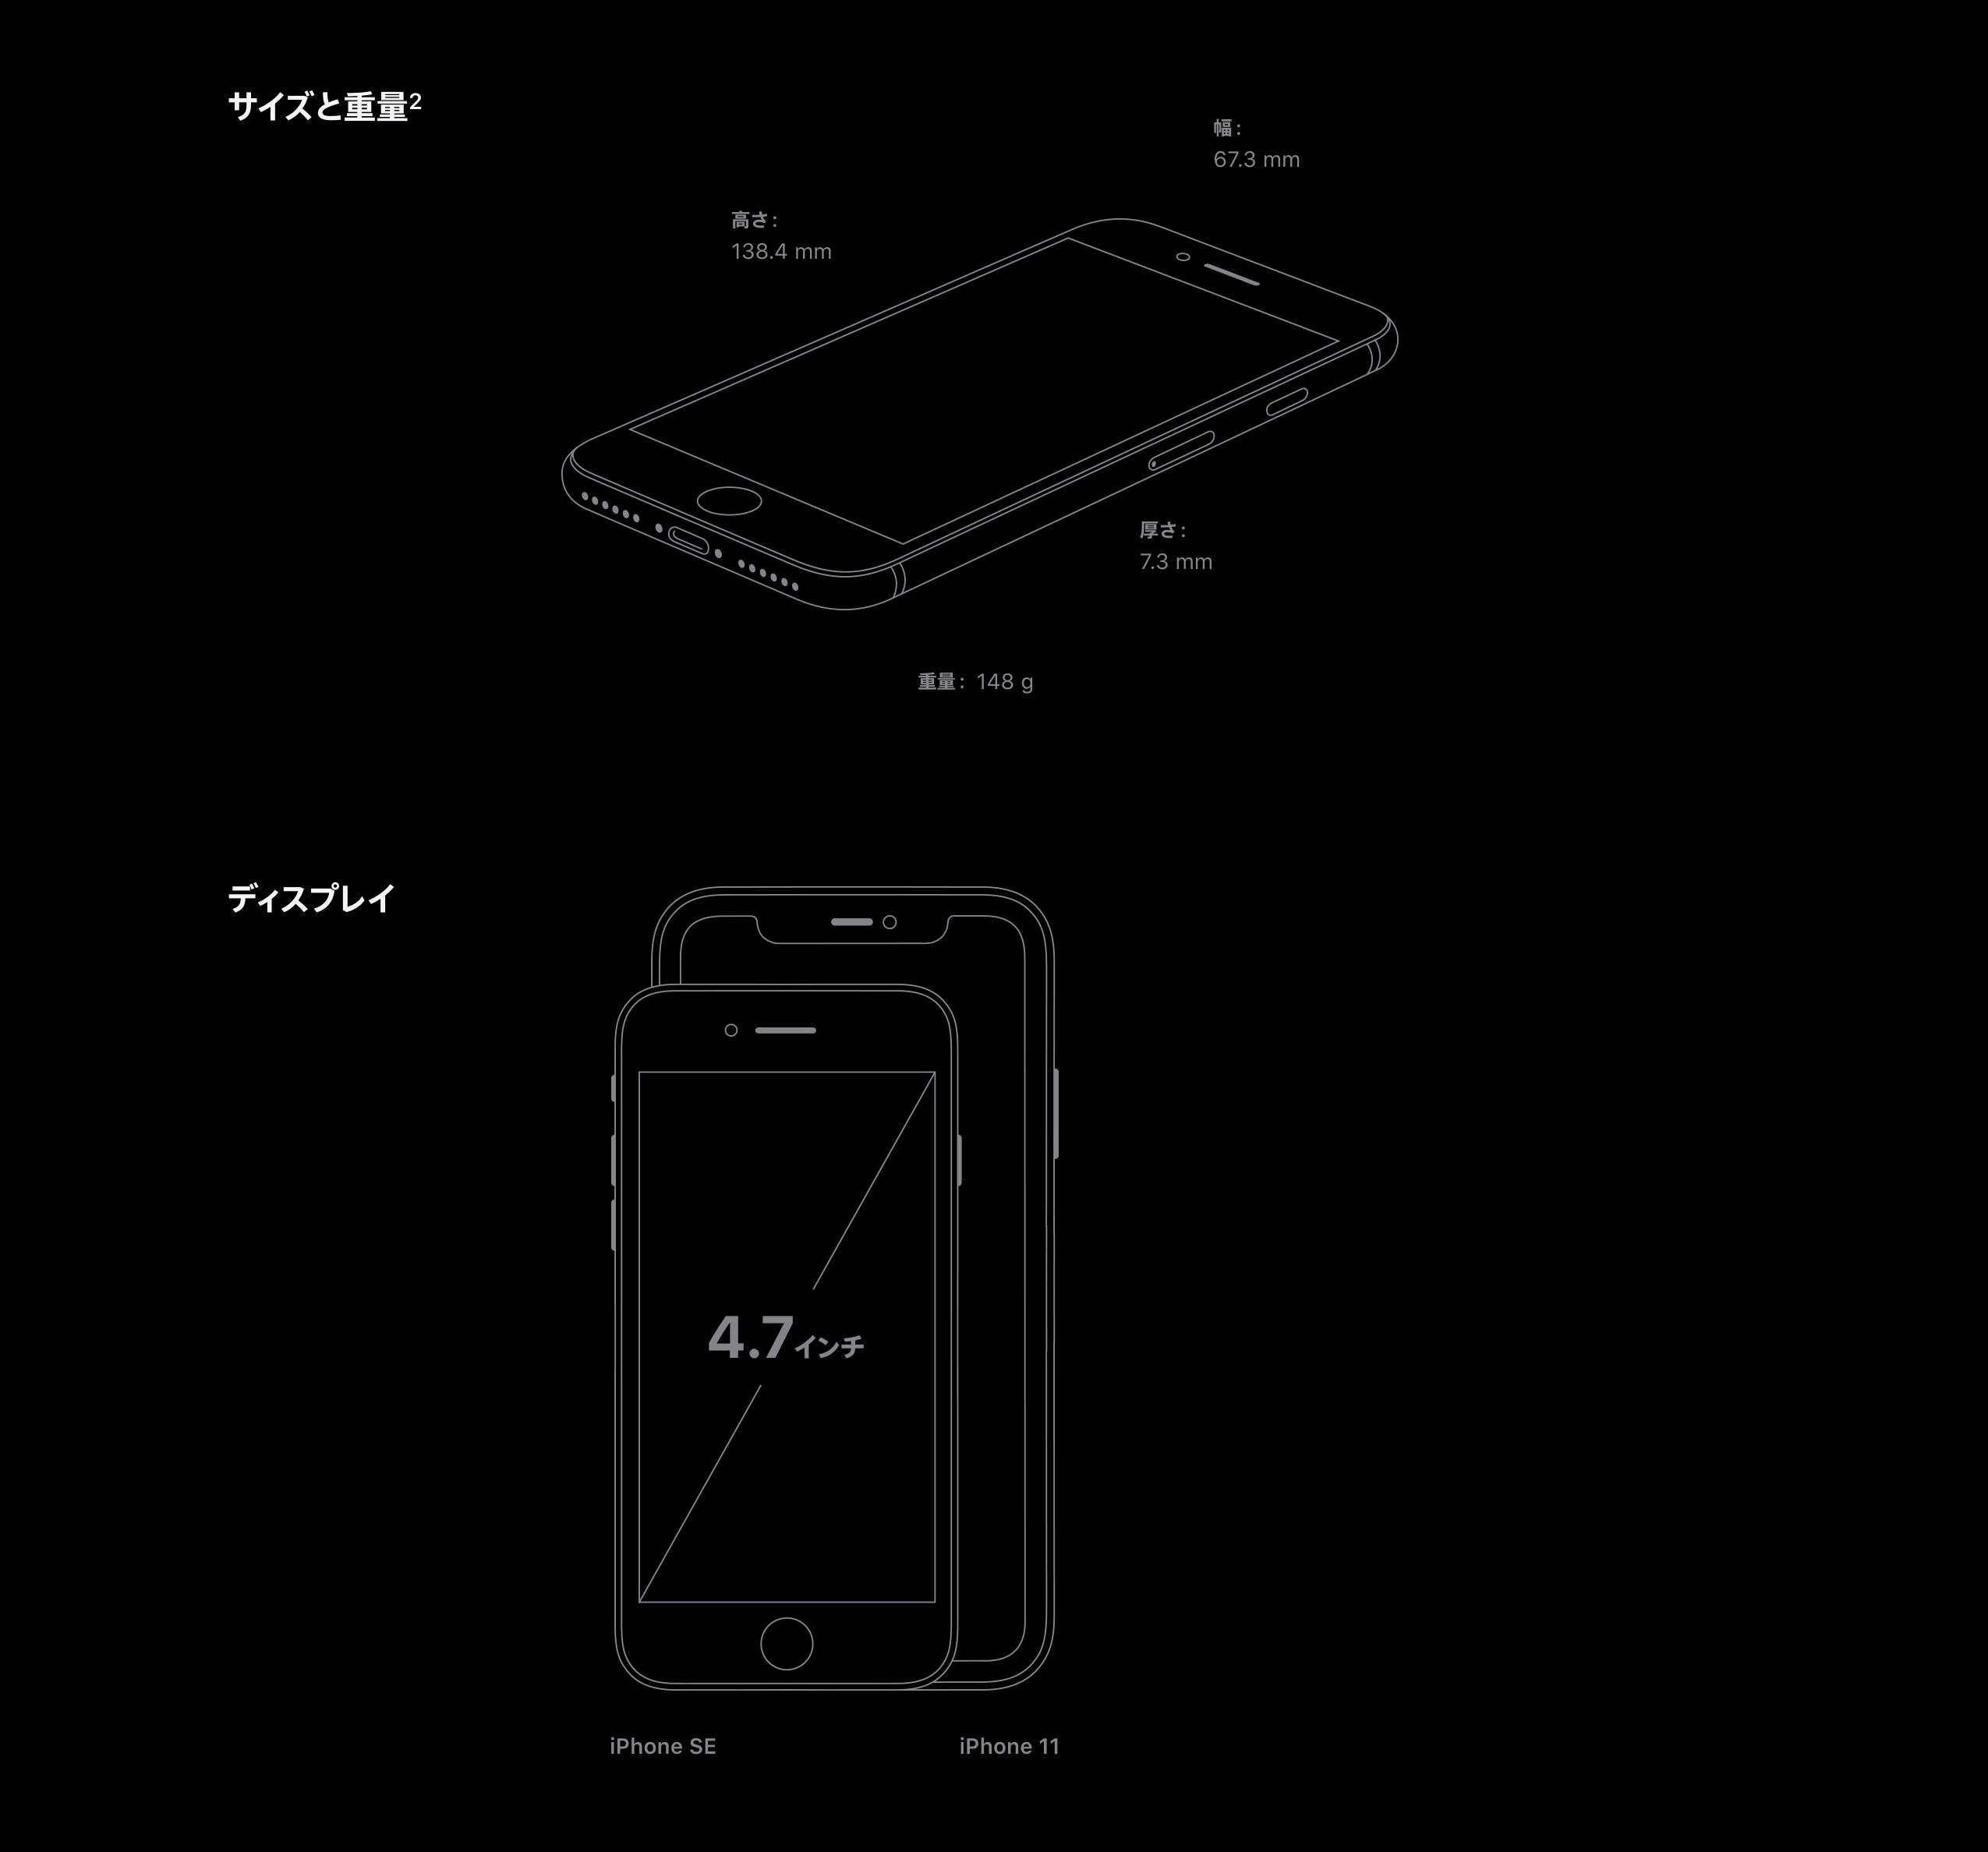 iphone se2 大き さ